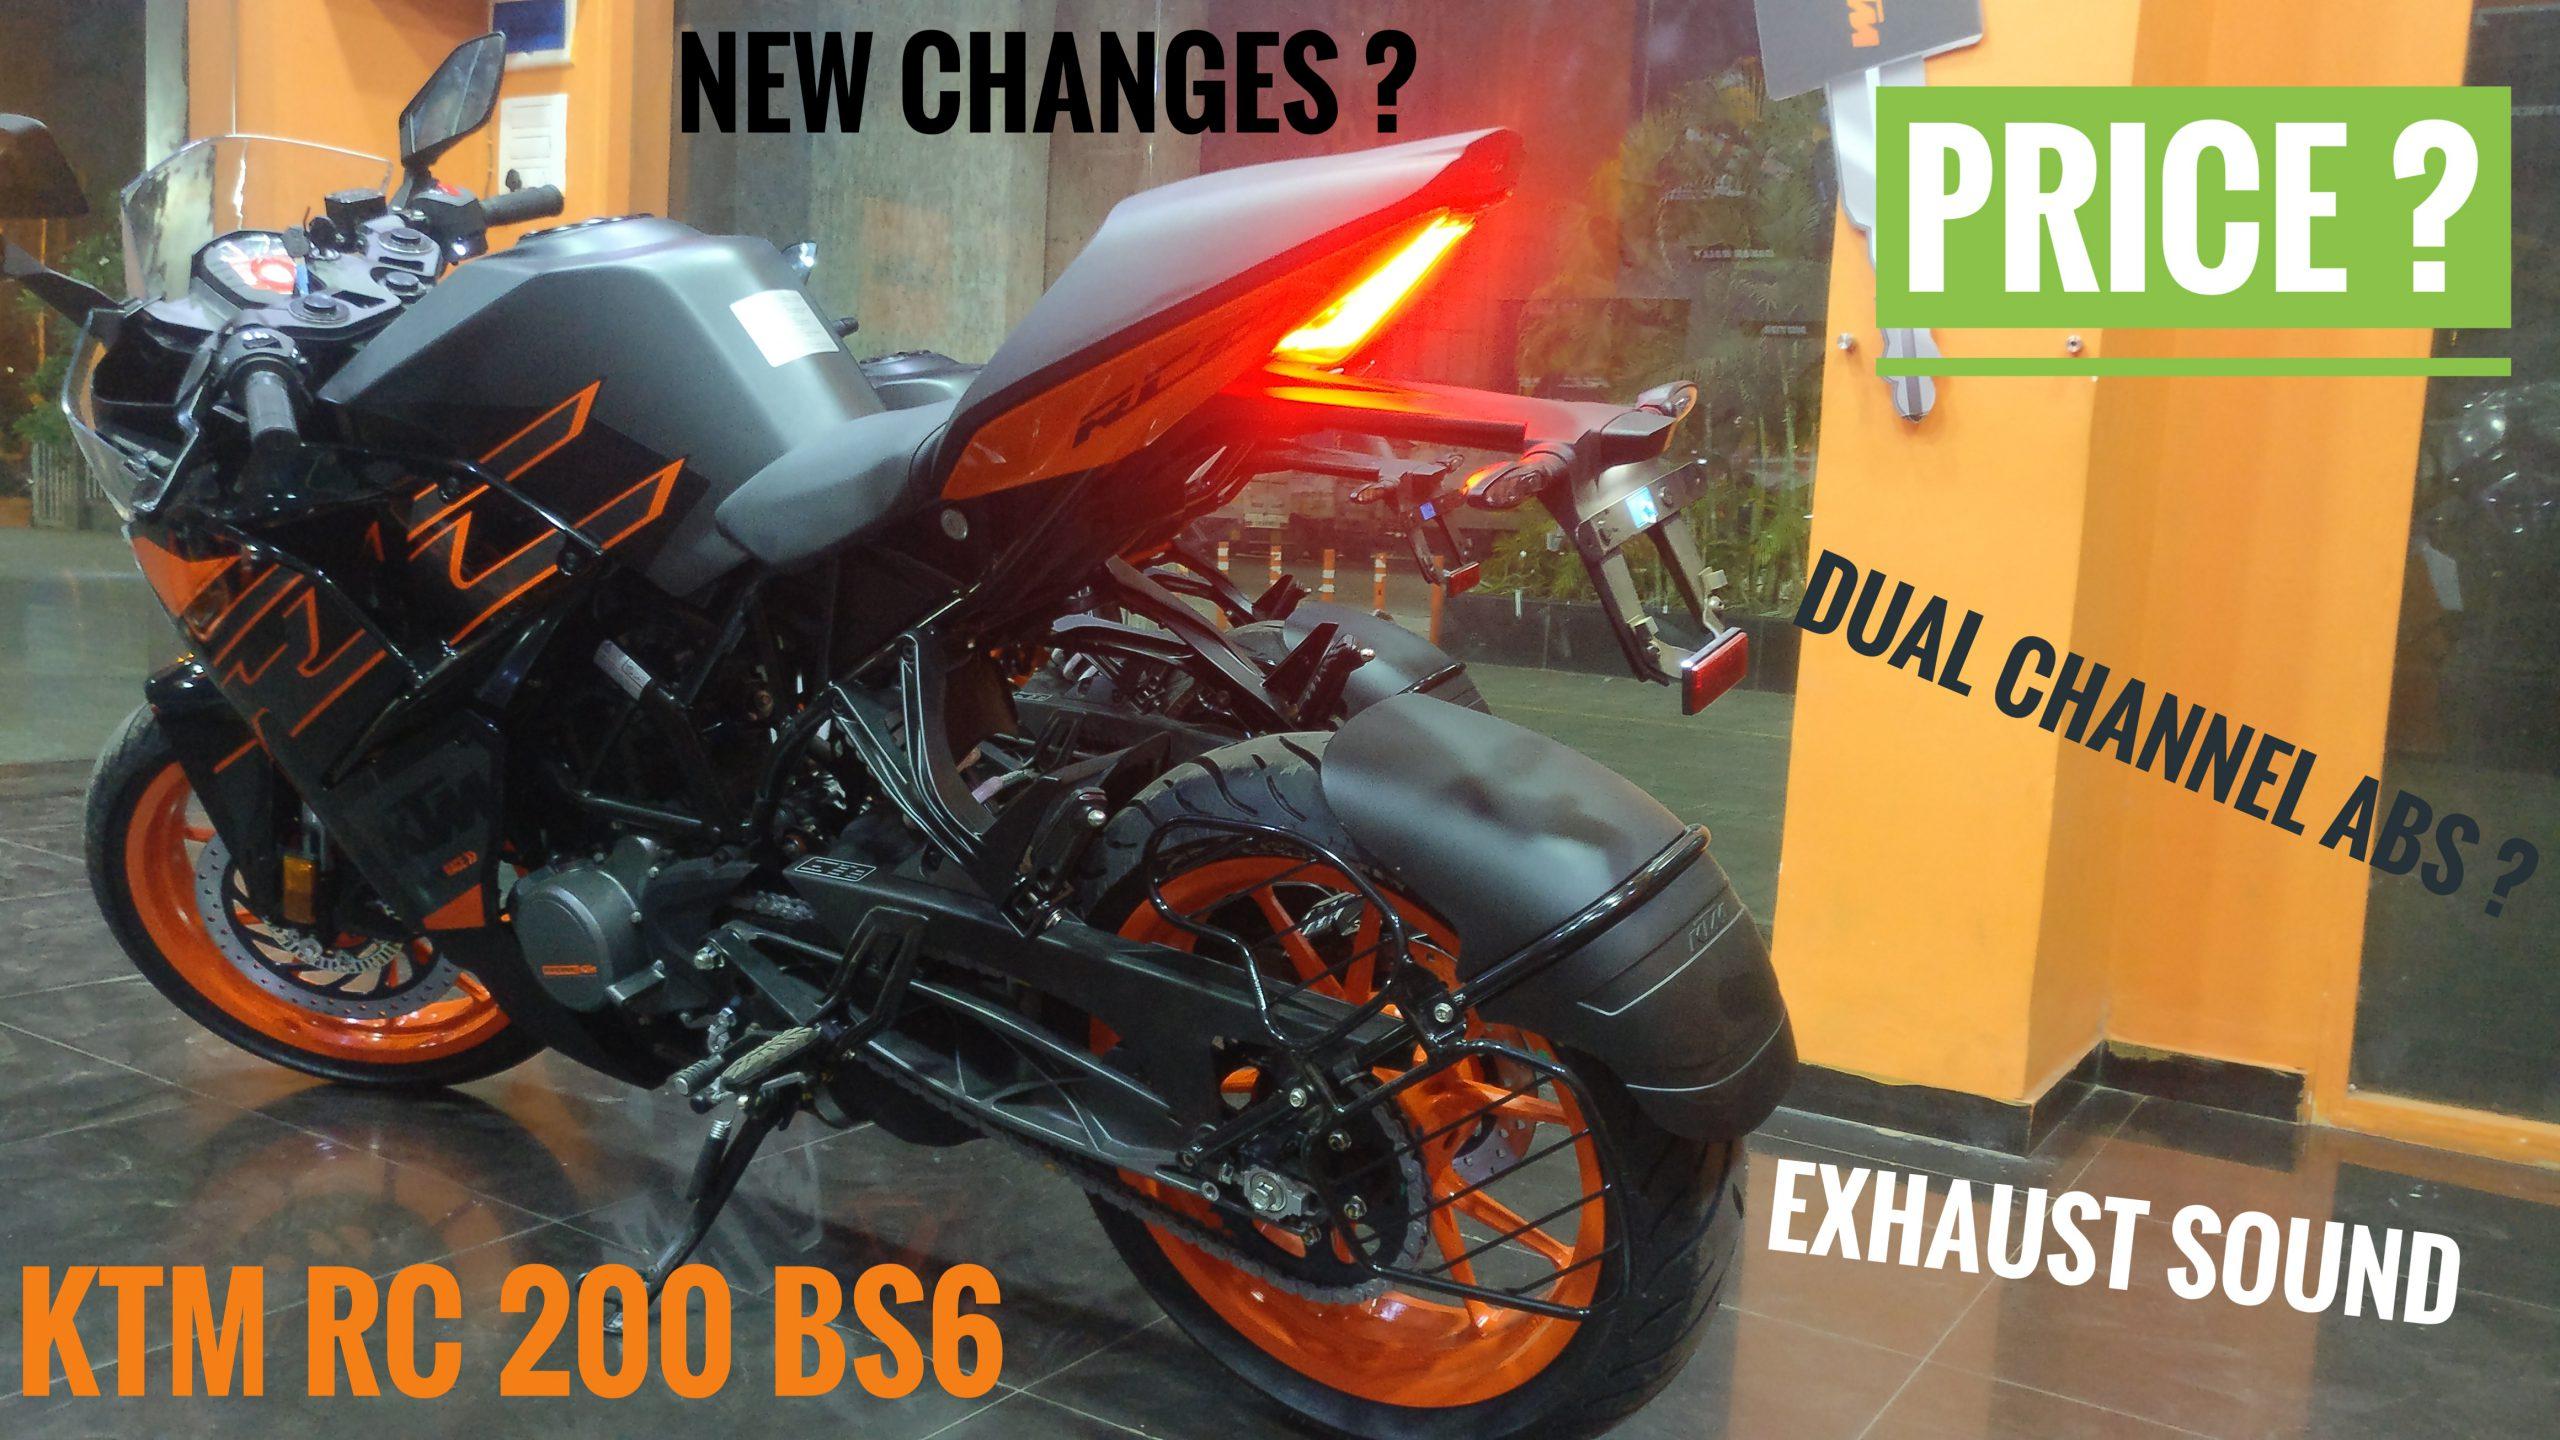 Ktm Duke 200 Black Colour Hd Wallpapers 2560x1440 Download Hd Wallpaper Wallpapertip